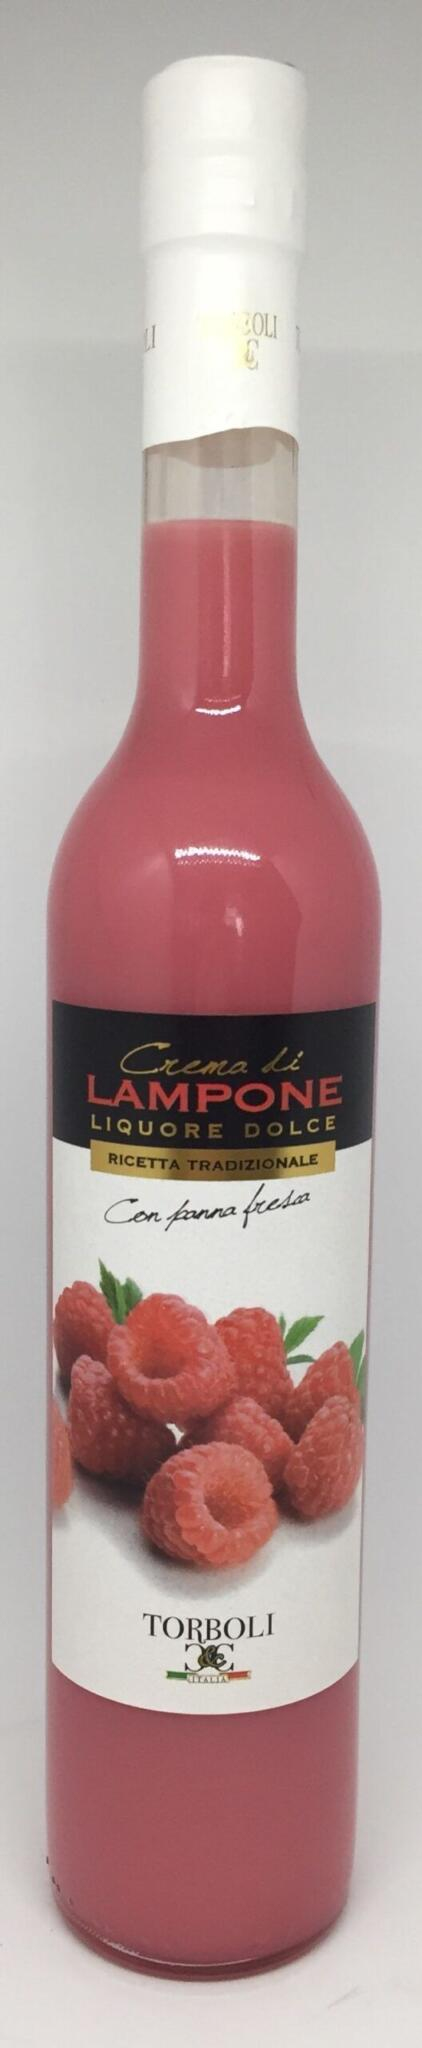 Hindbær likør cremet fra Torboli Italien